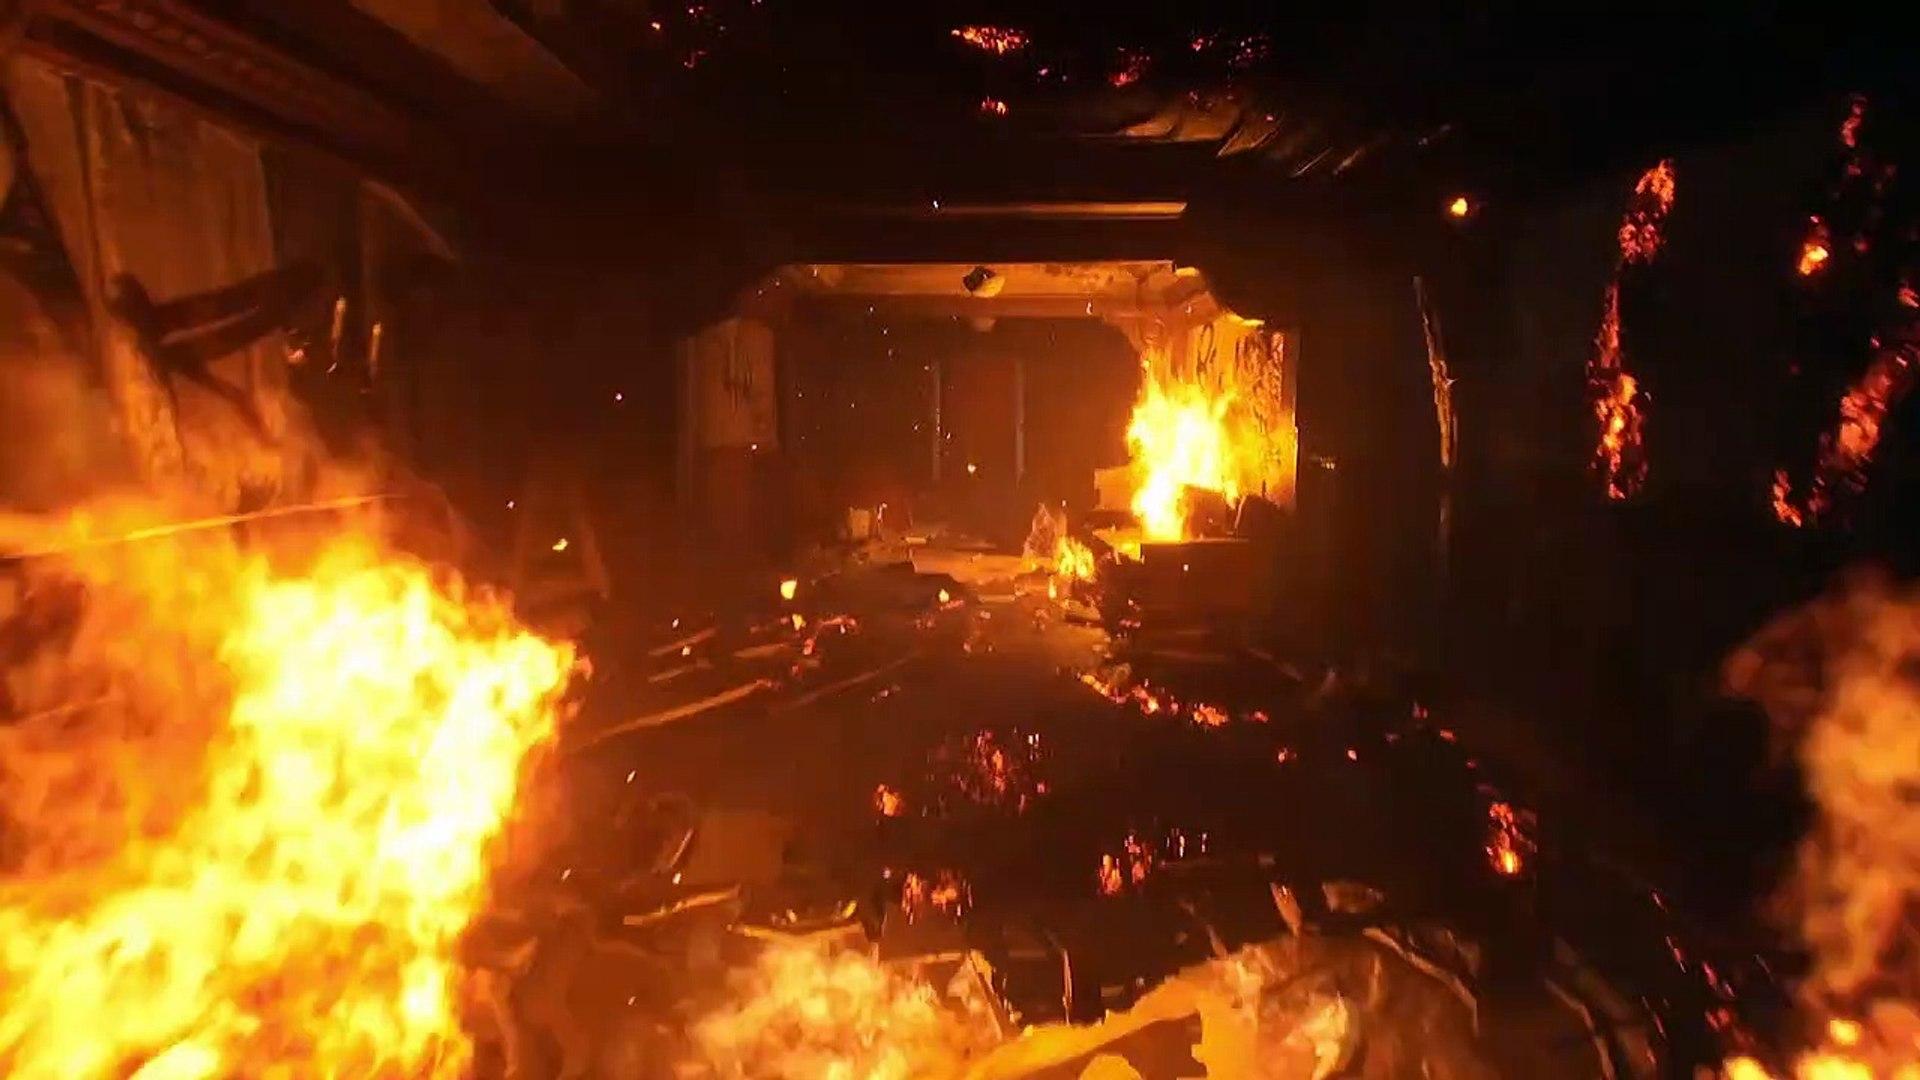 Vampire : The Masquerade - Bloodlines 2 (E3 2019 PC Gaming Show Trailer)